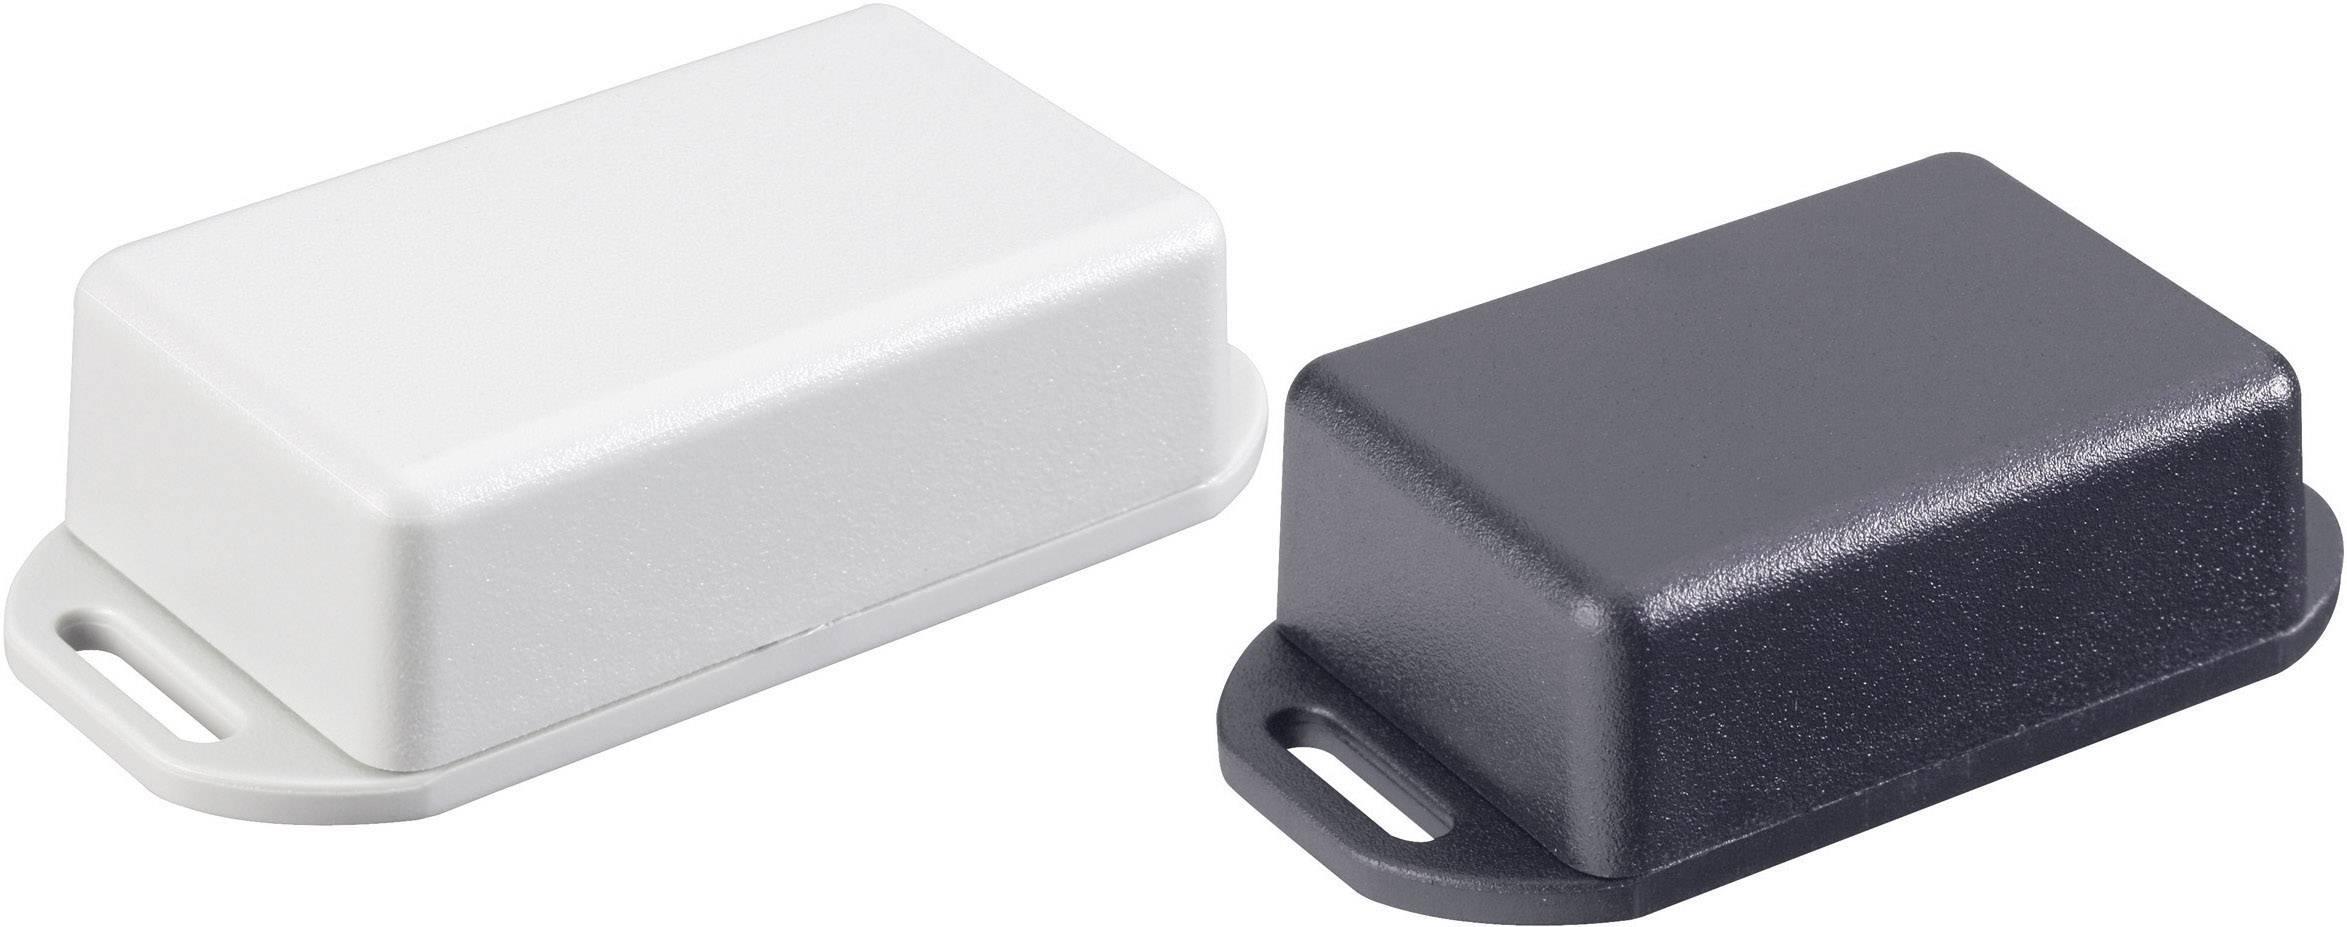 Euro krabice Hammond Electronics 1551KFLBK 1551KFLBK, 80 x 40 x 20 , ABS, čierna, 1 ks